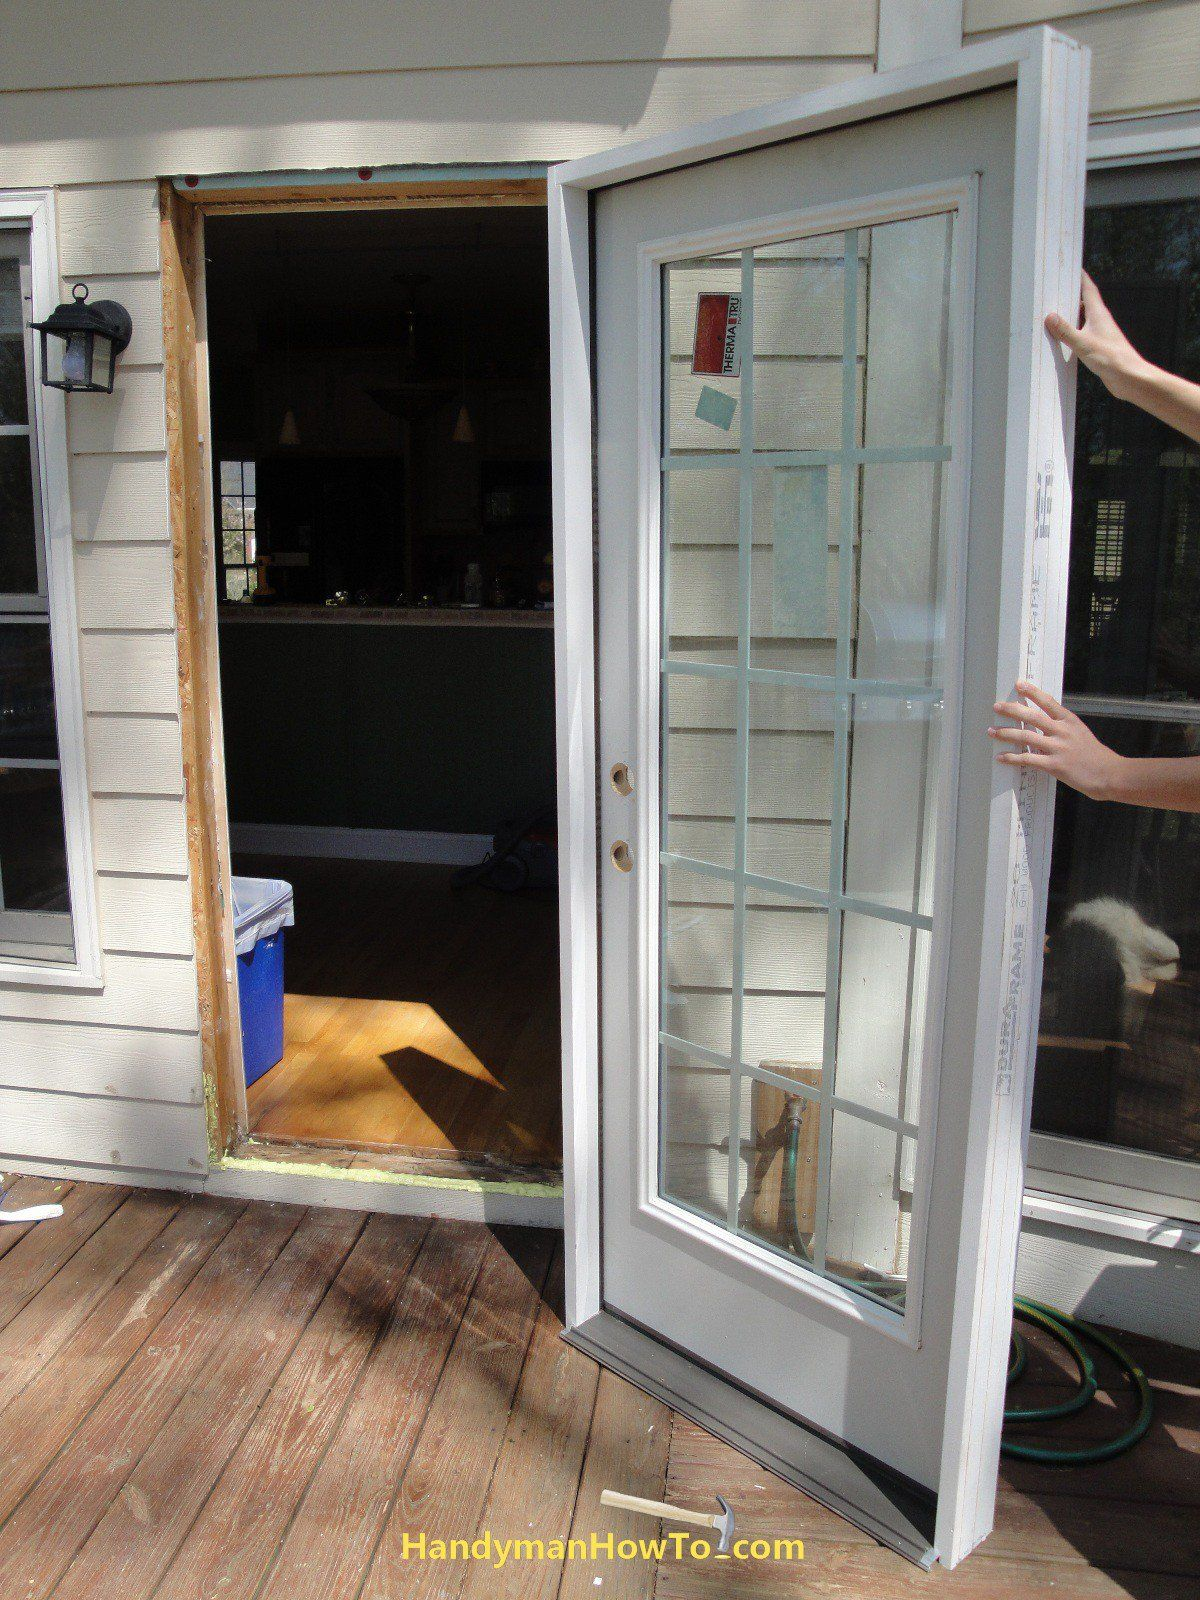 How To Replace An Exterior Door Install The New Pre Hung Exterior Door Seal The Threshold Shim Door Installation Installing Exterior Door Diy Exterior Door